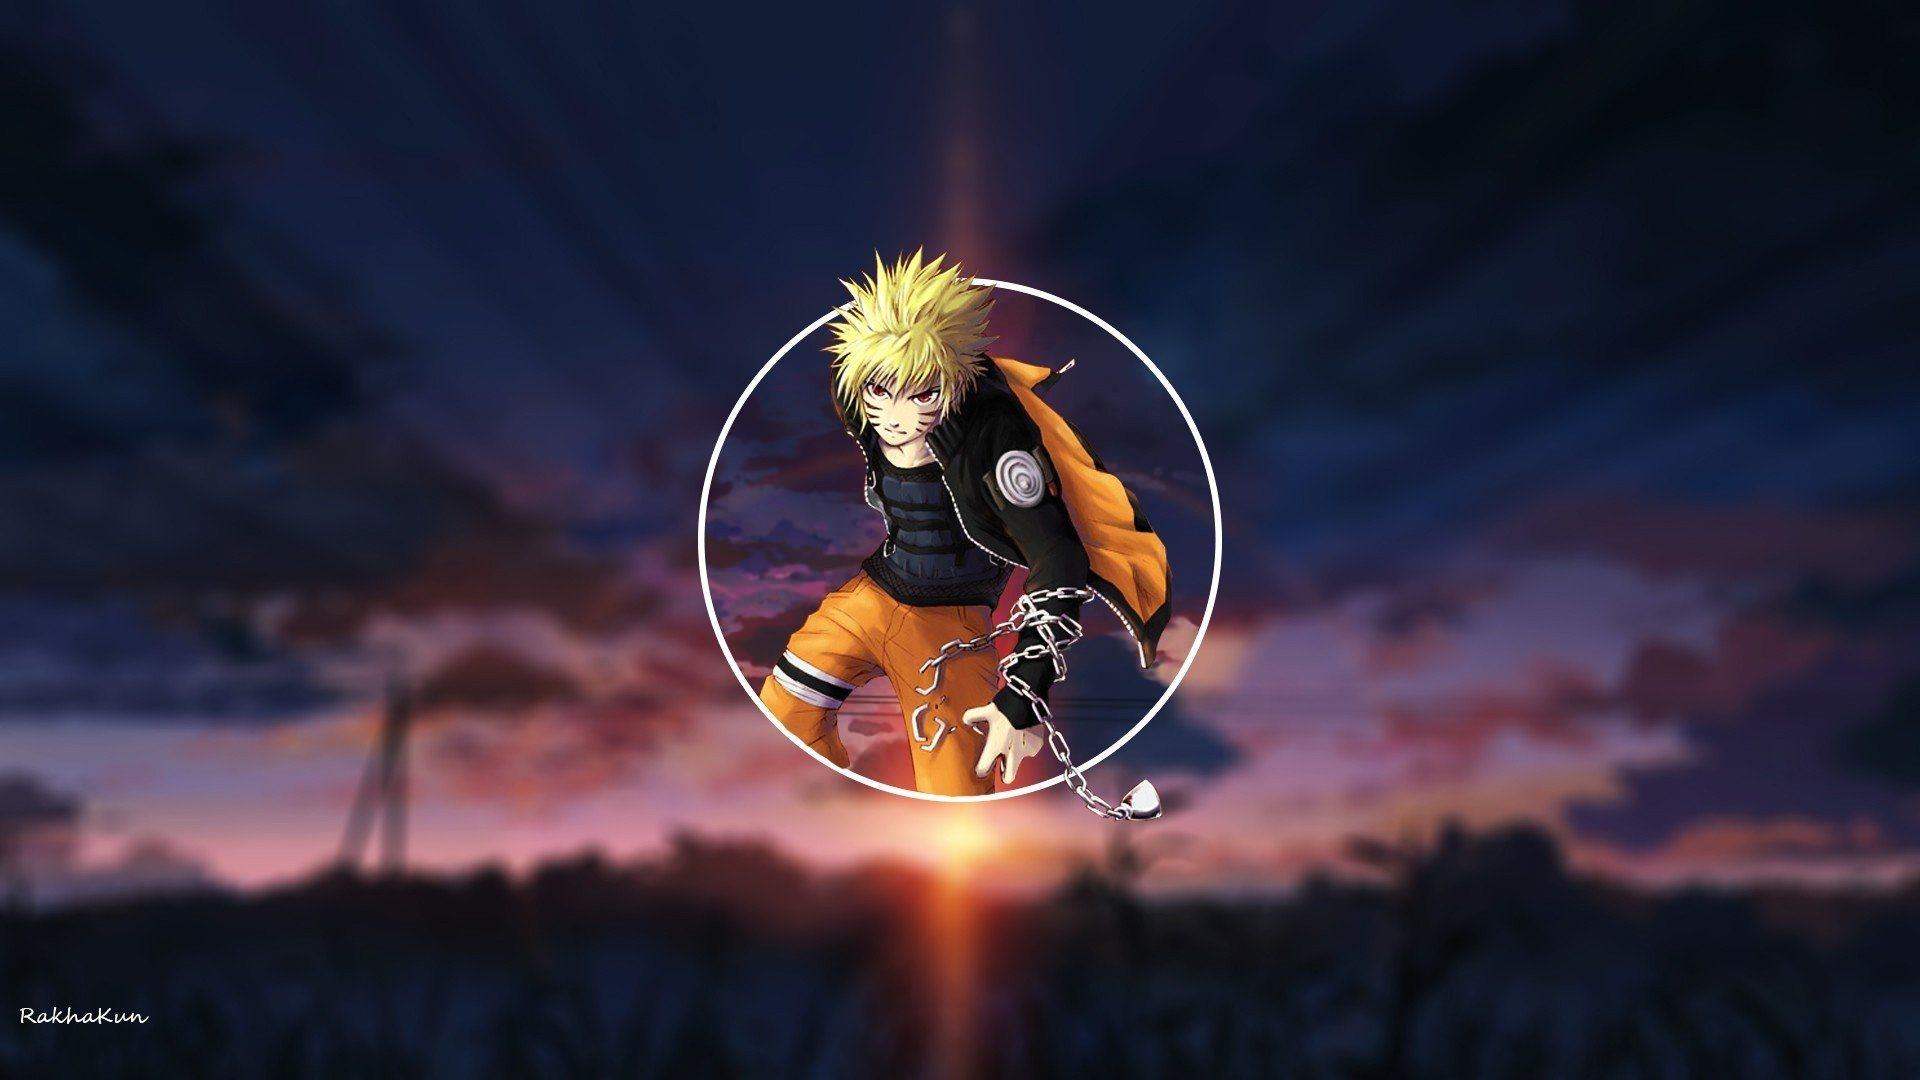 Naruto Wallpaper Hd, Background